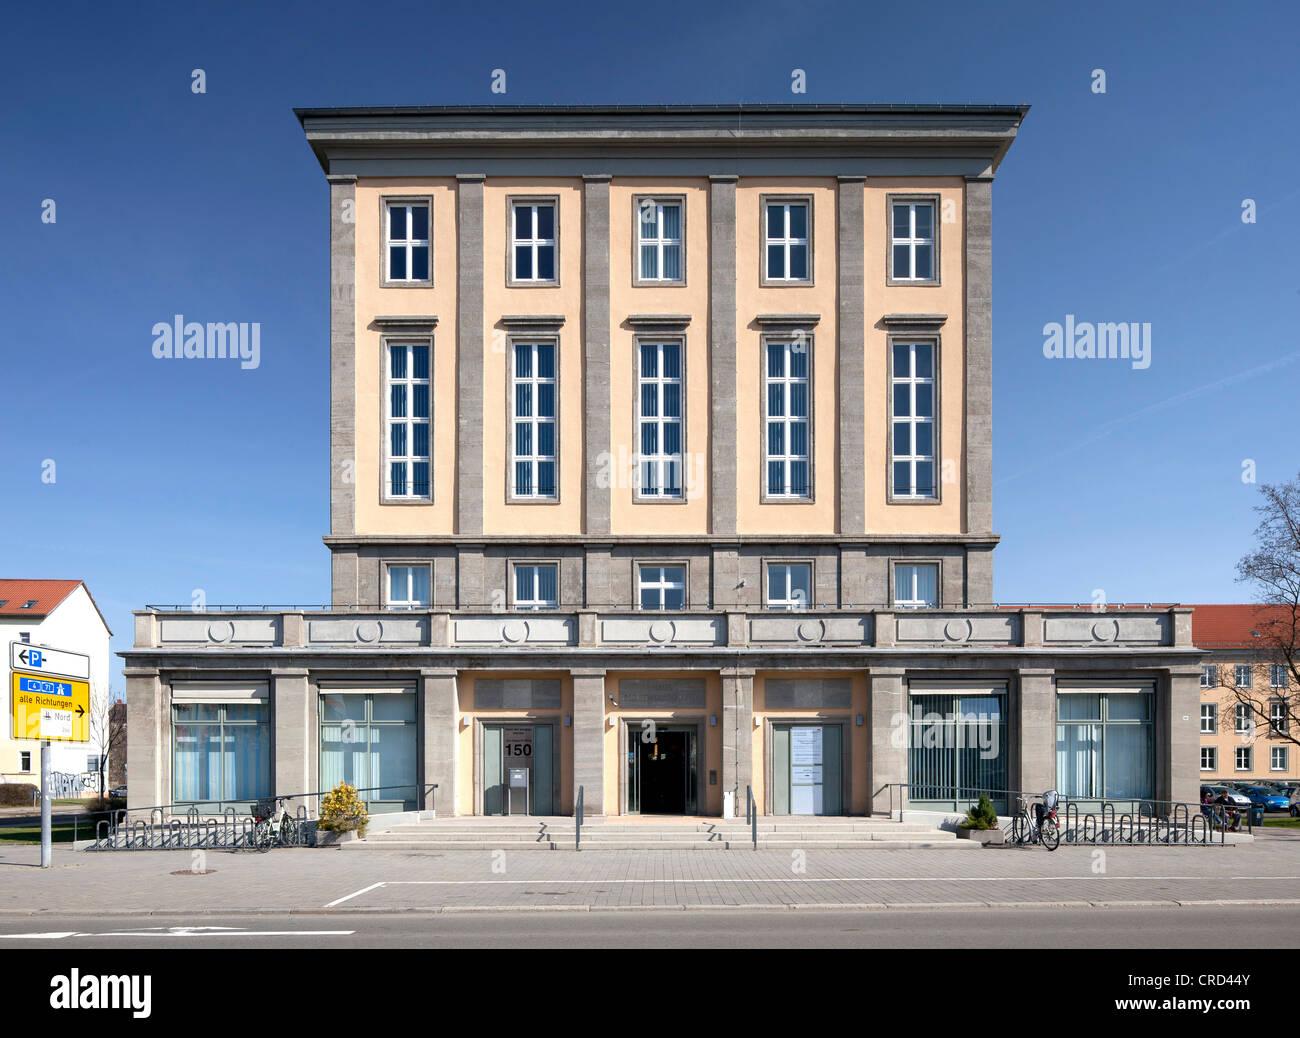 Union House, Casa de Servicios Sociales, Erfurt, Turingia, Alemania, Europa, PublicGround Imagen De Stock